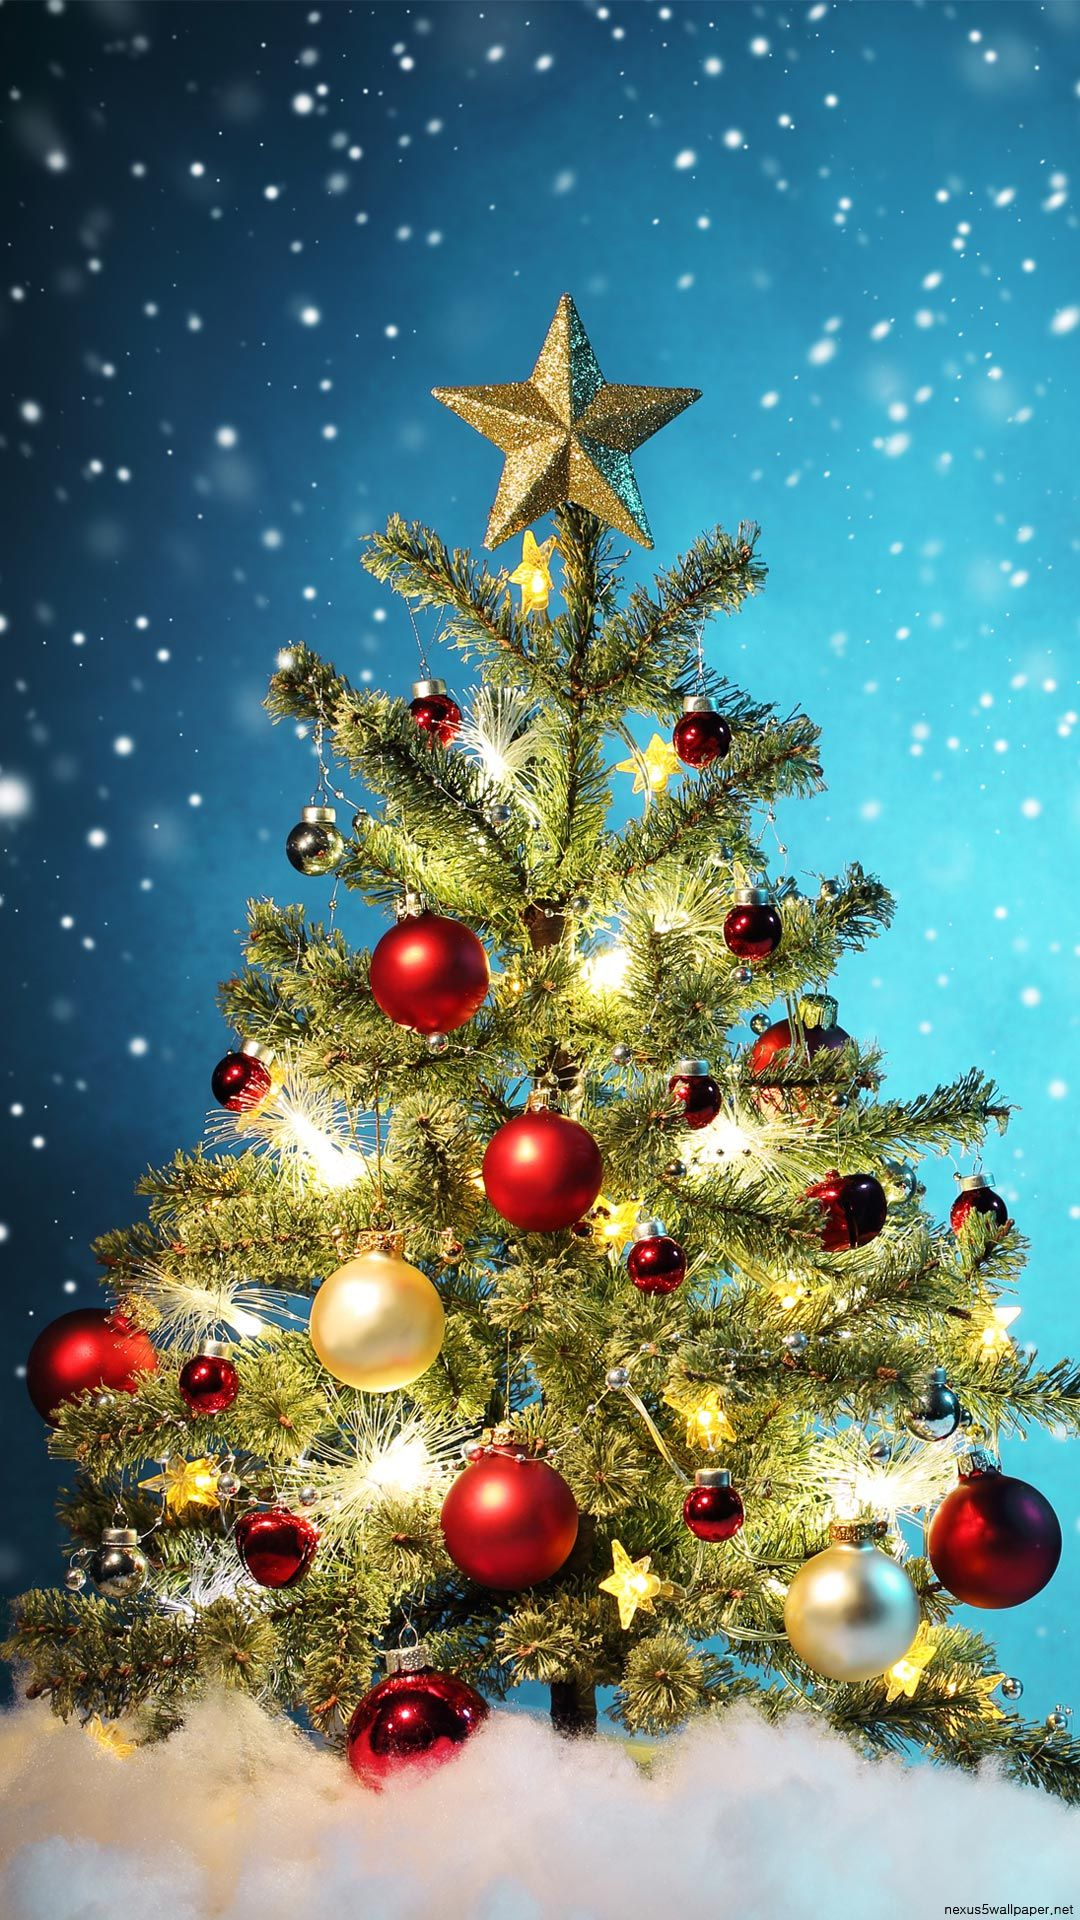 iphone 6+ wallpaper christmas Google Search クリスマスの壁紙